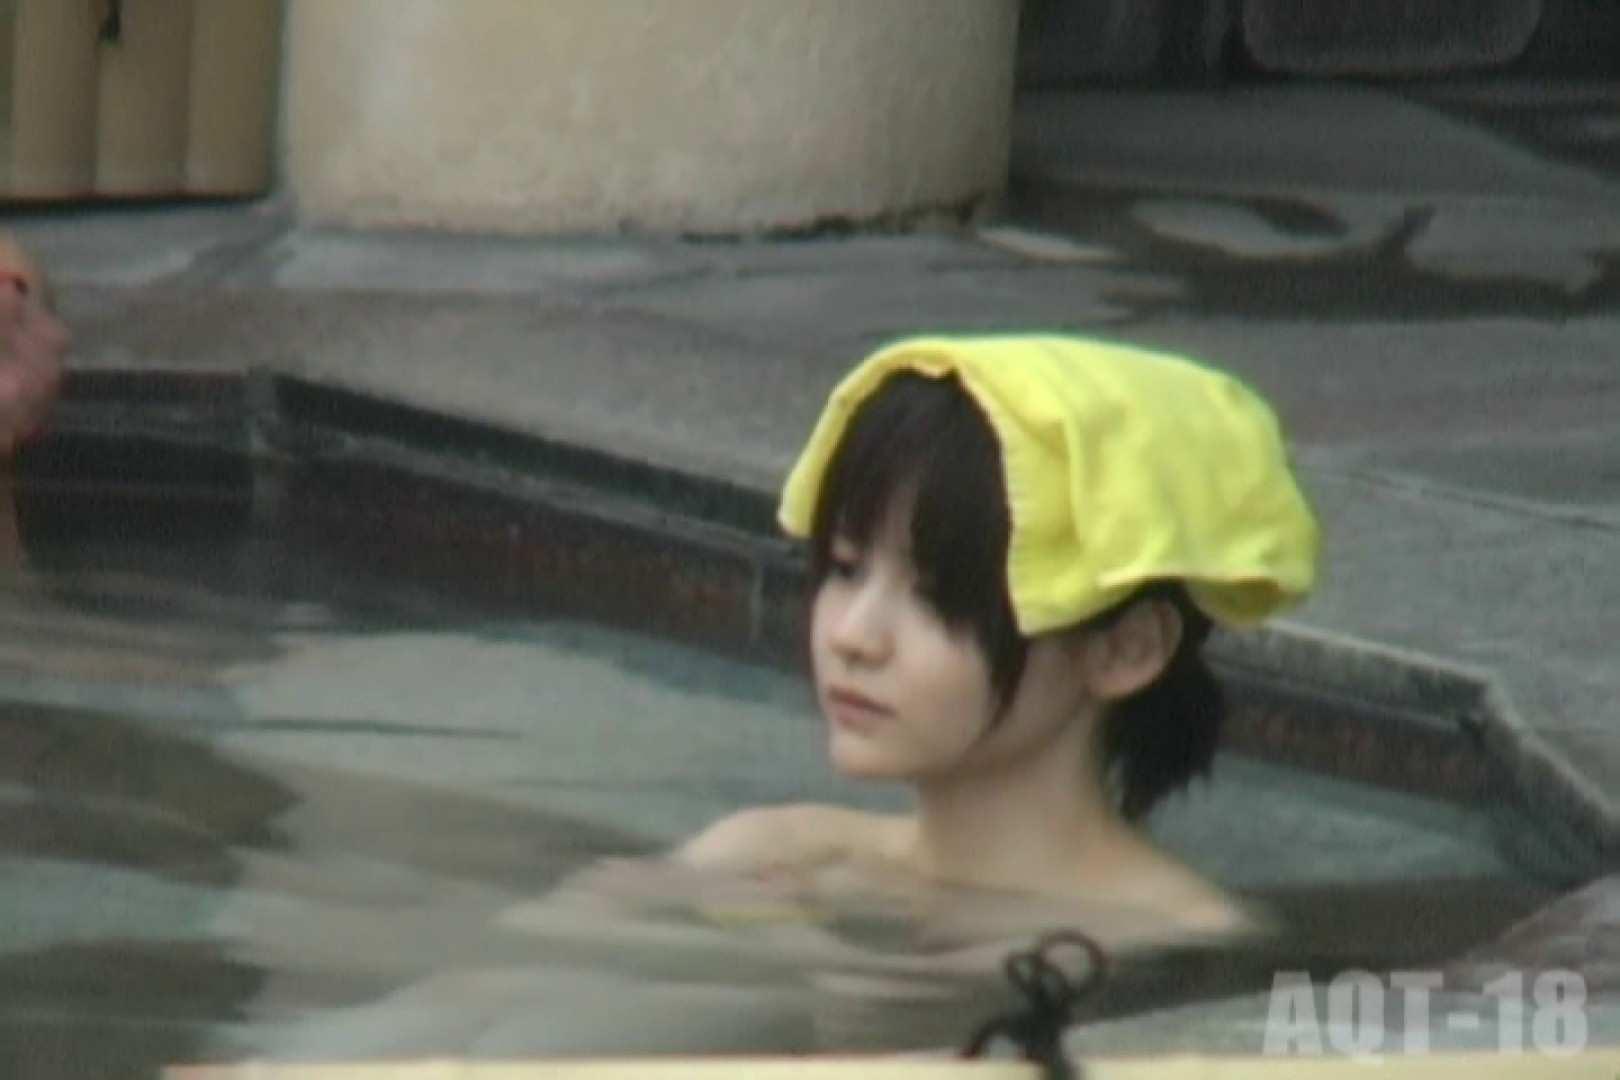 Aquaな露天風呂Vol.854 盗撮師作品  97pic 30